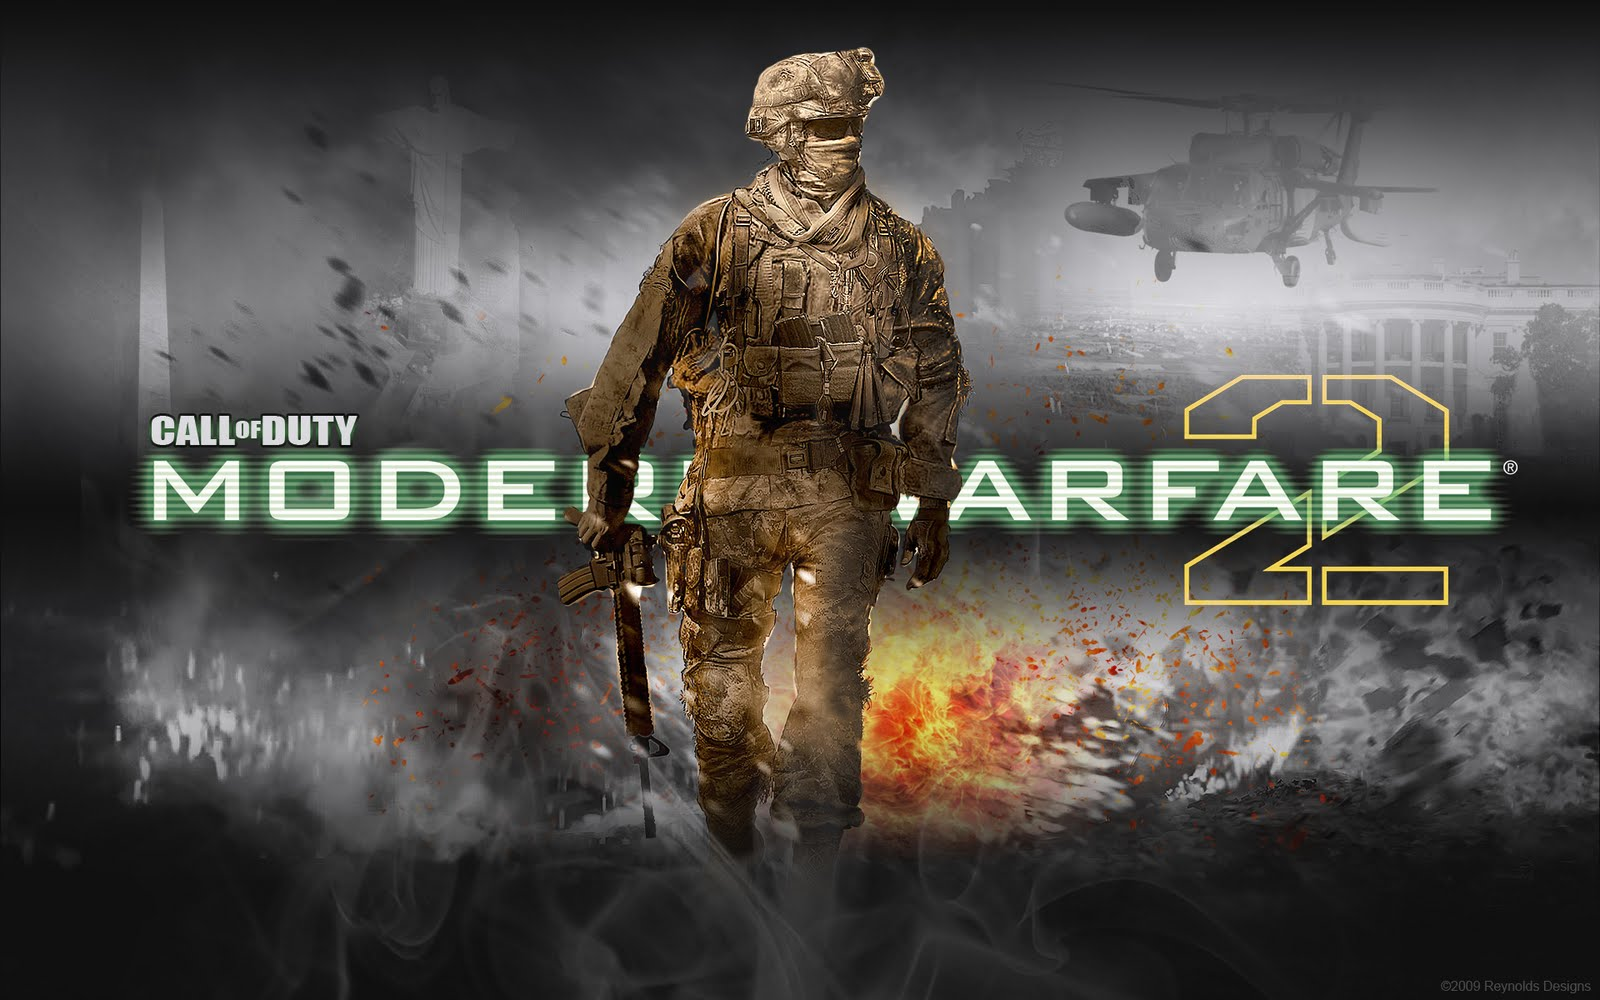 http://2.bp.blogspot.com/-2MUeQPsoWnM/Ti1ohQ7BNMI/AAAAAAAAI5E/o7IjEfefsds/s1600/modern+warfare+2+wallpaper+hd_3.jpg